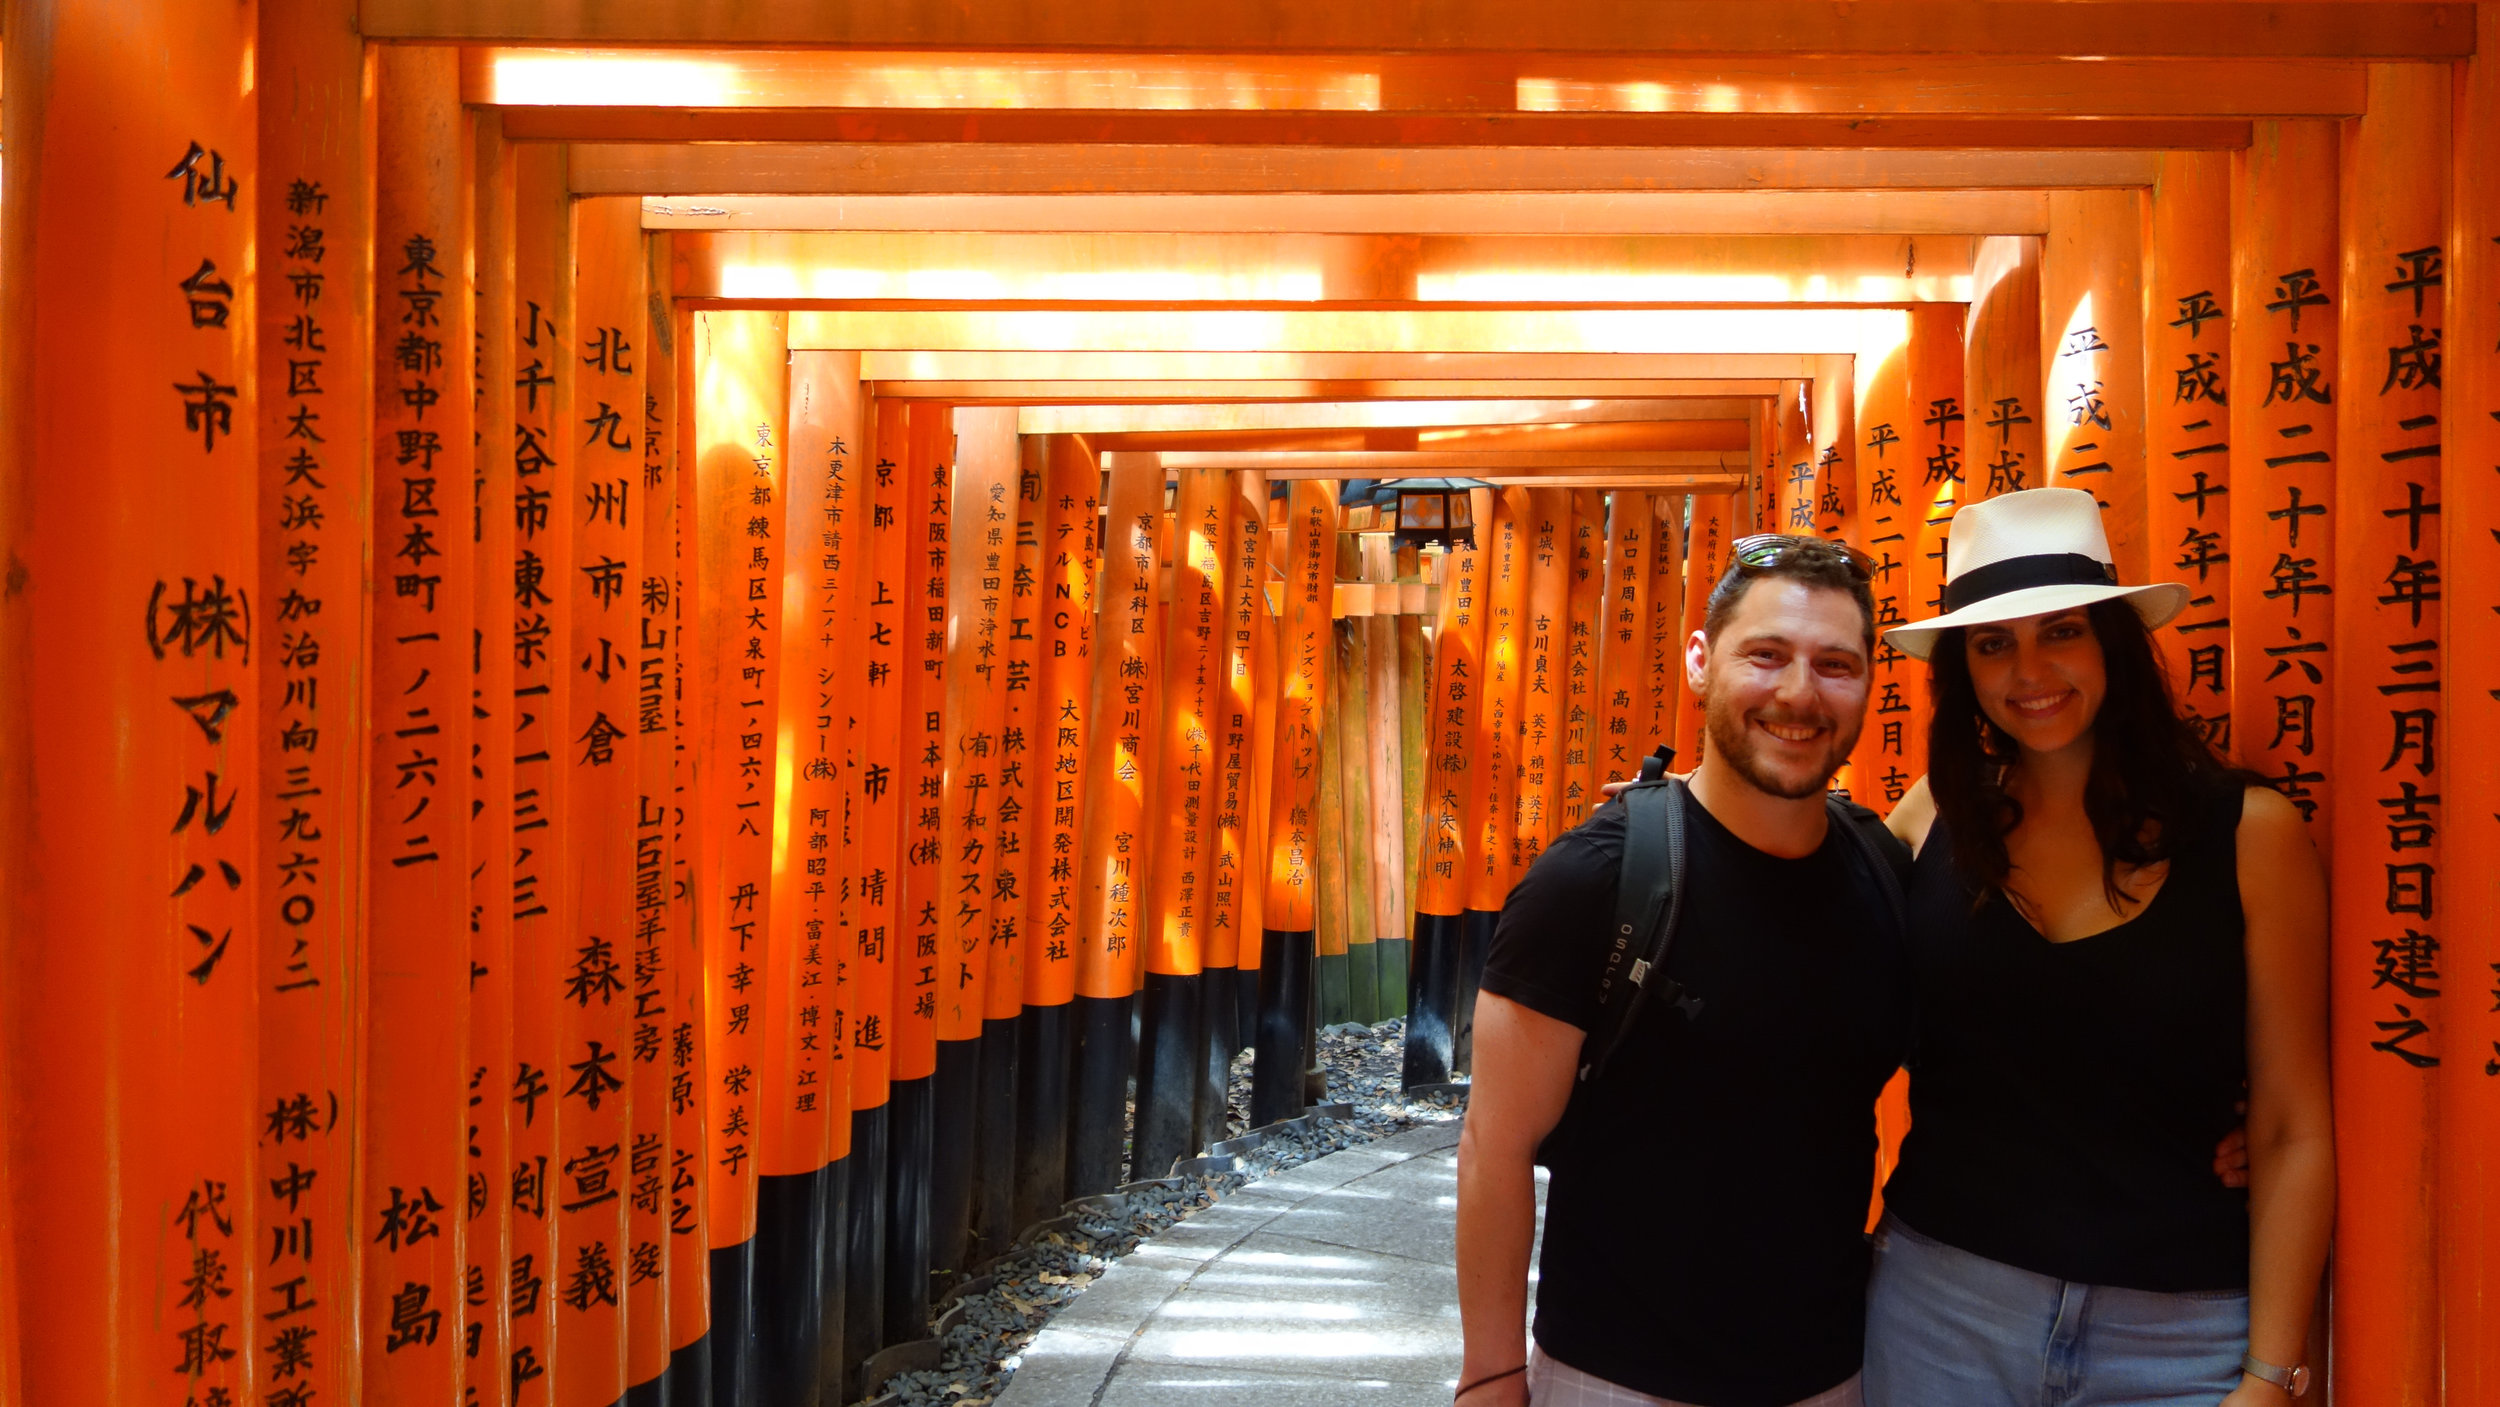 Fushimi-Inari-Shrine-torii-gates.jpg